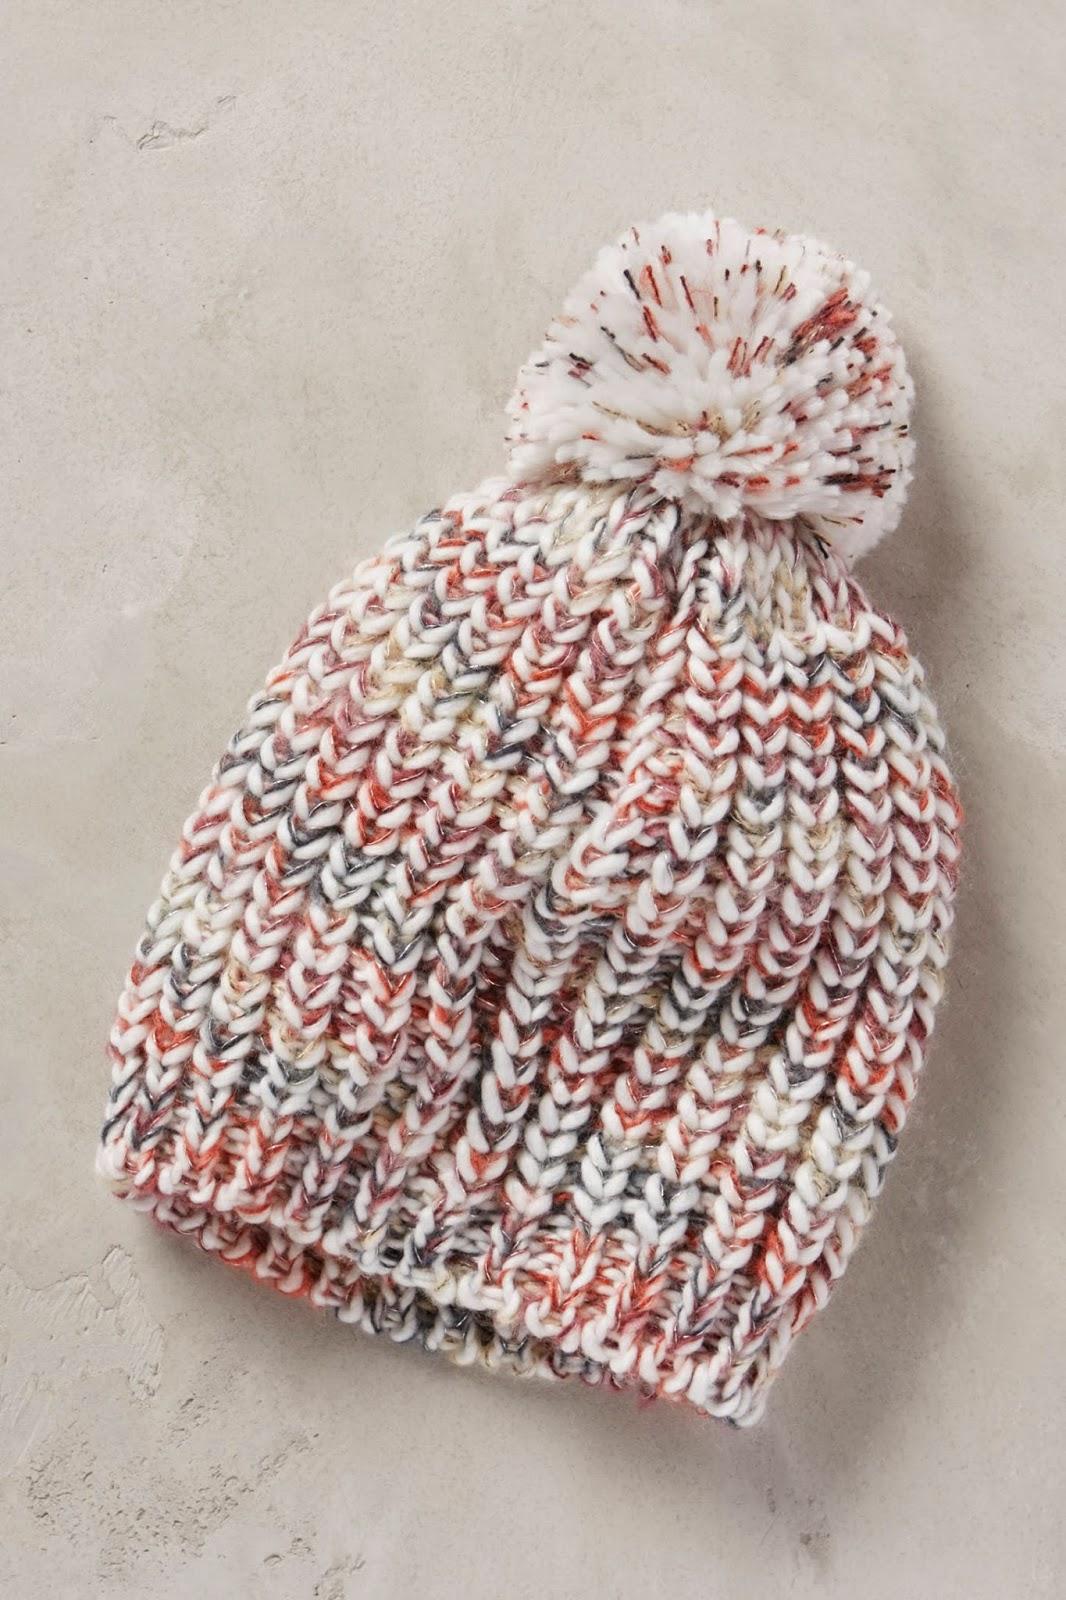 5 Ribbed Knit Hat Patterns - The Funky Stitch